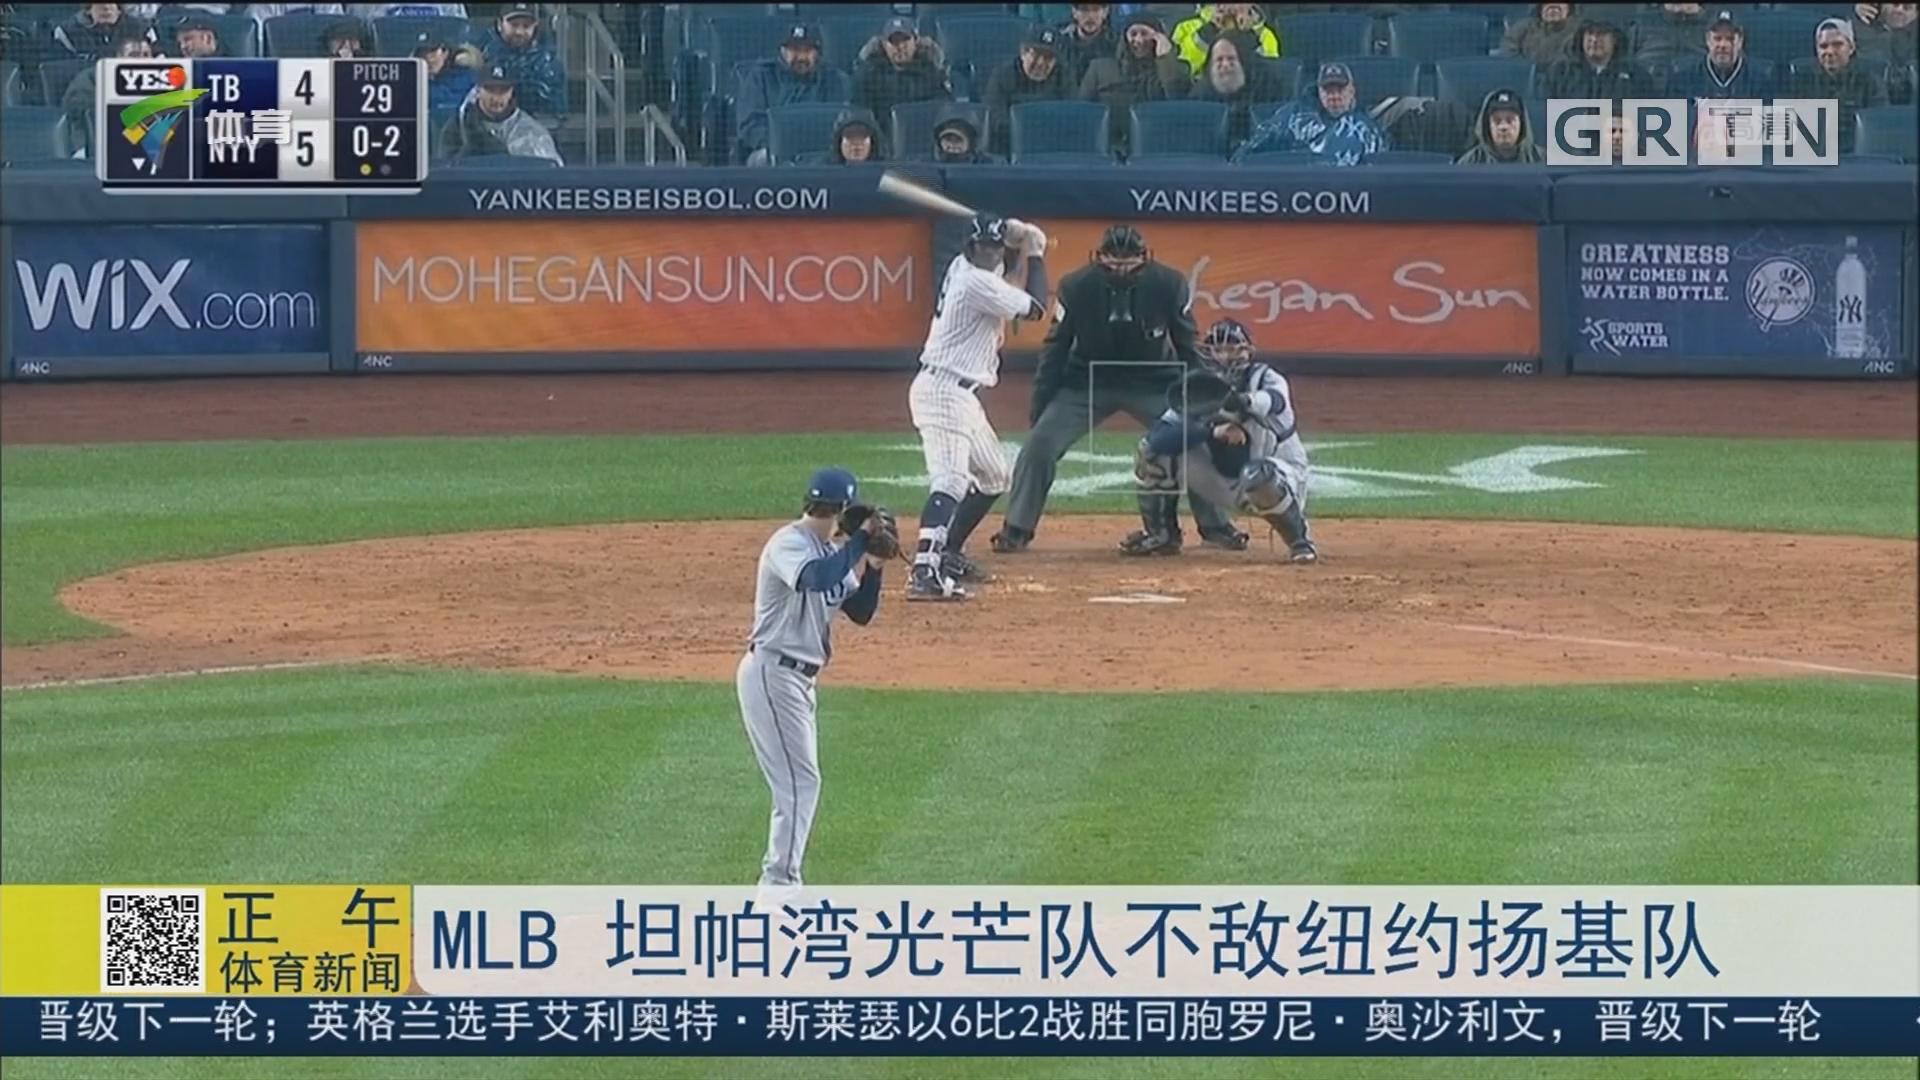 MLB 坦帕湾光芒队不敌纽约扬基队